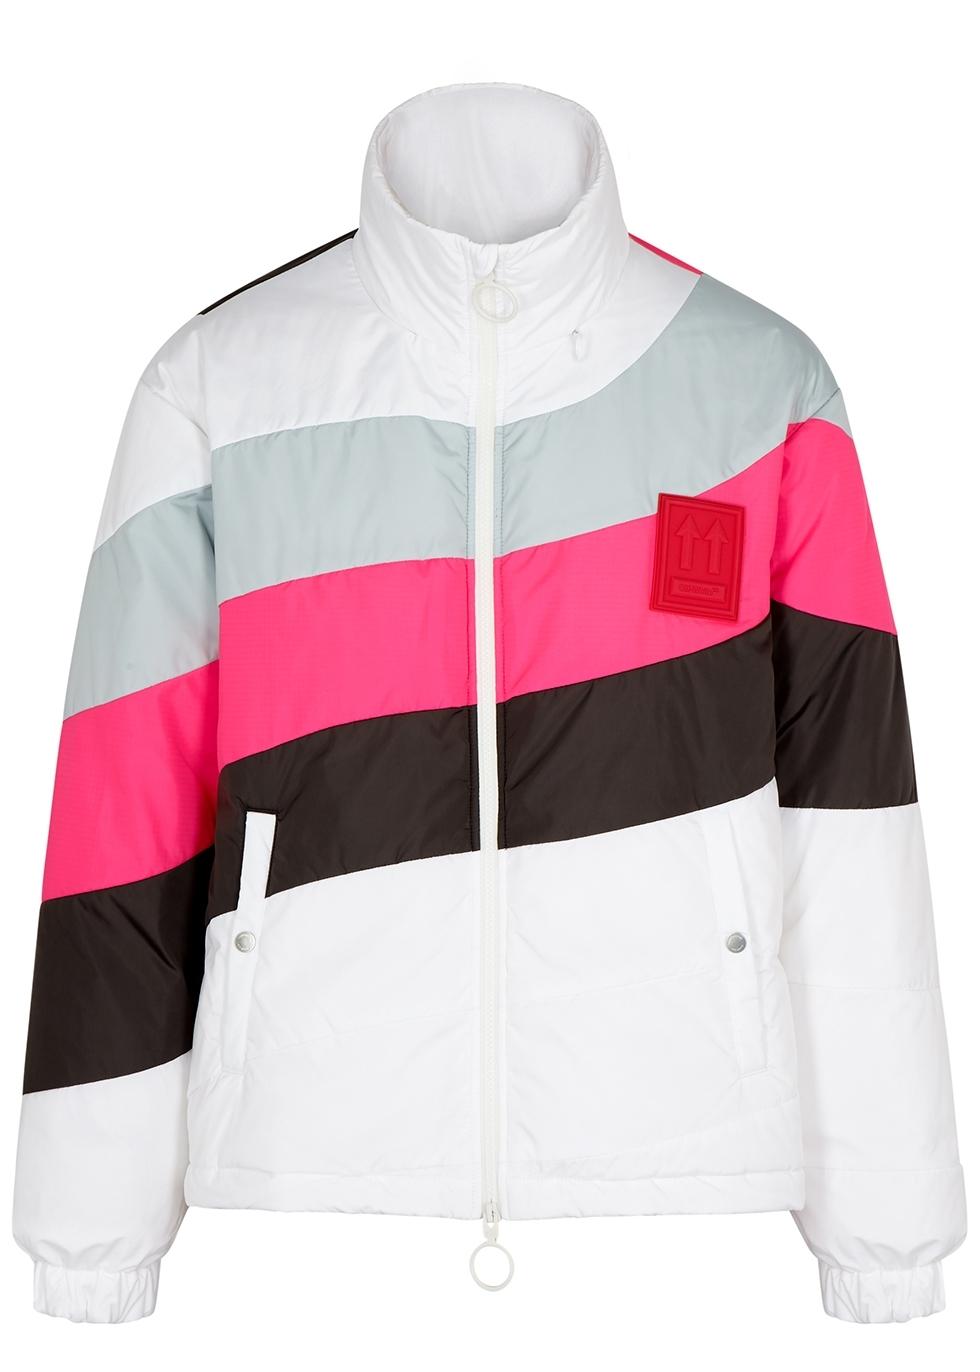 b60b037c9 Men's Designer Shell Jackets - Streetwear Jackets For Men - Harvey Nichols